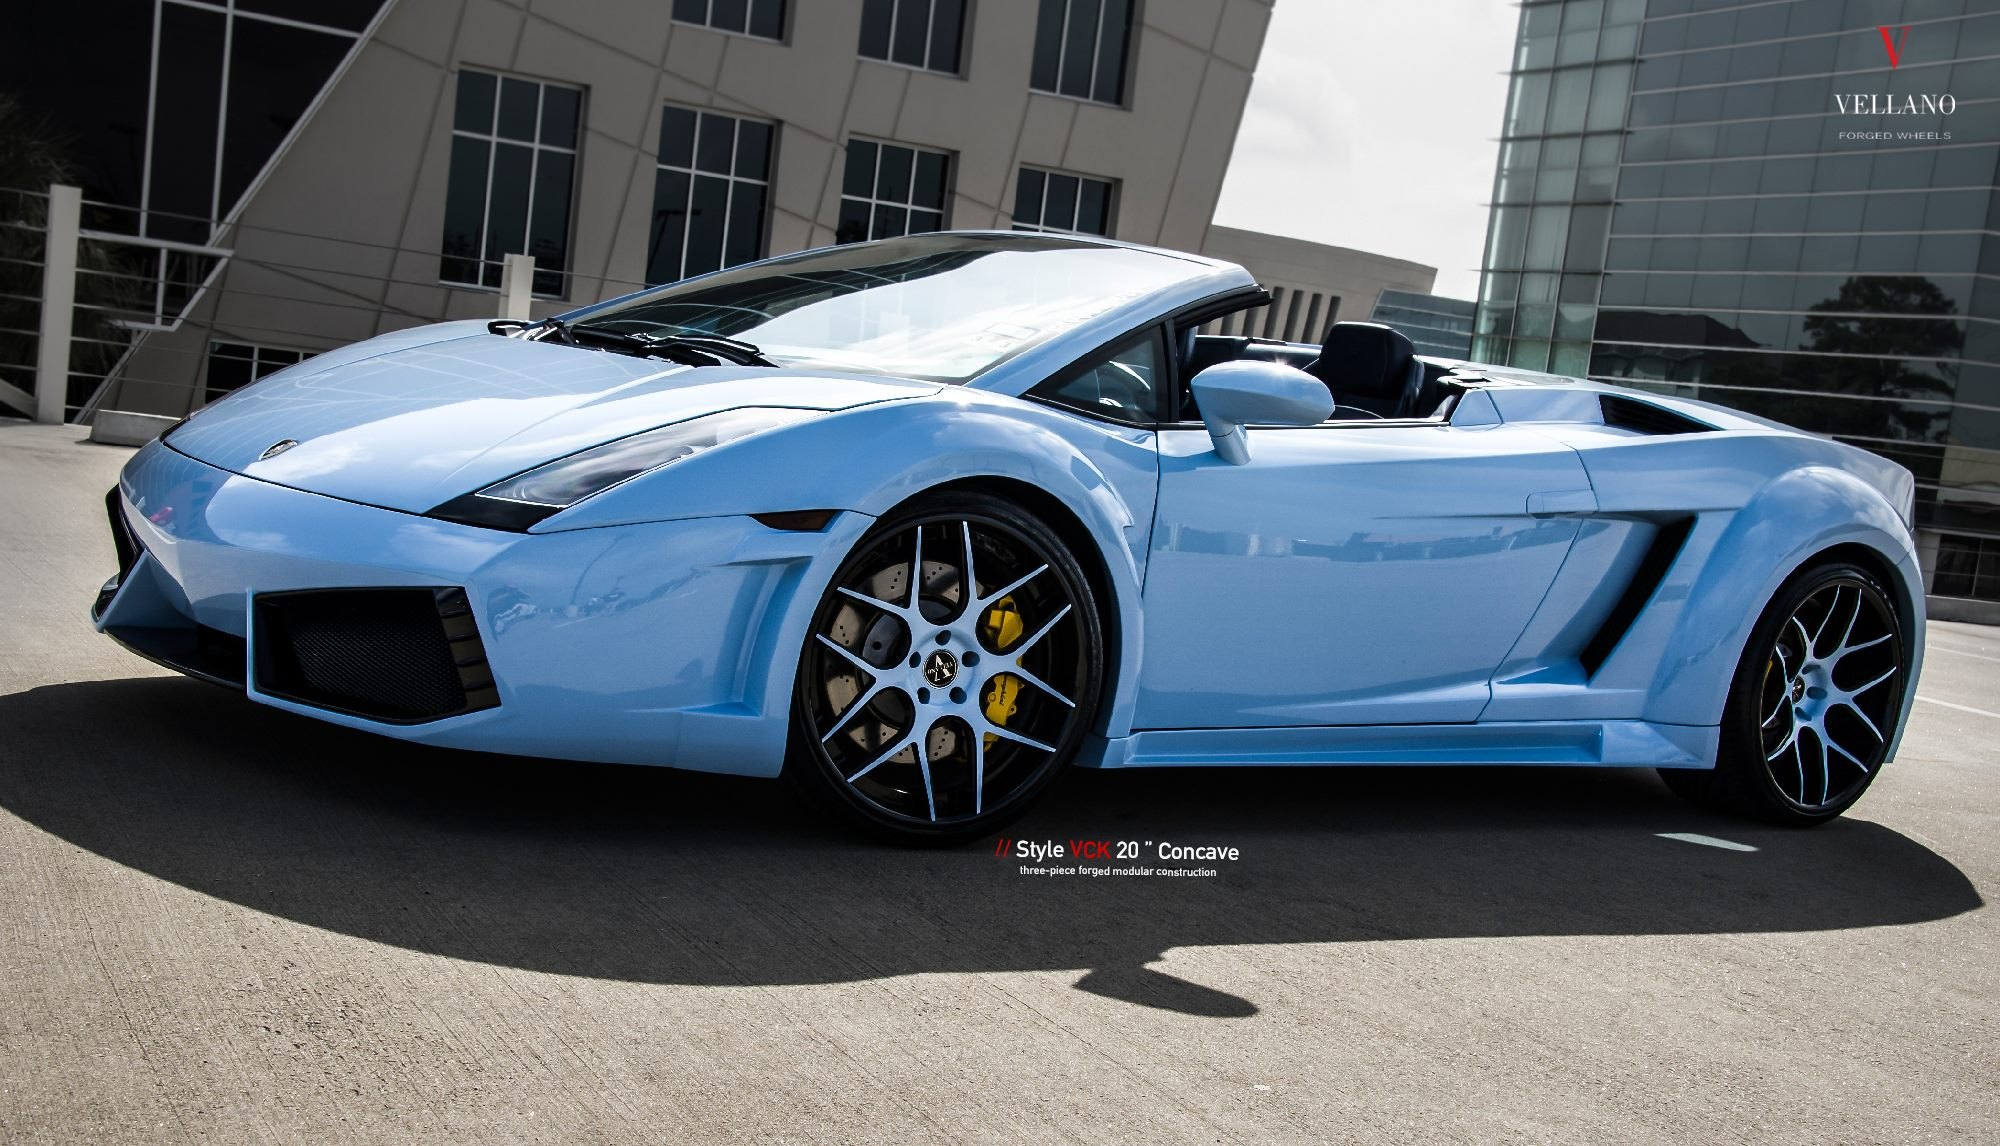 Baby Blue Convertible Lamborghini Gallardo Customized And Put On